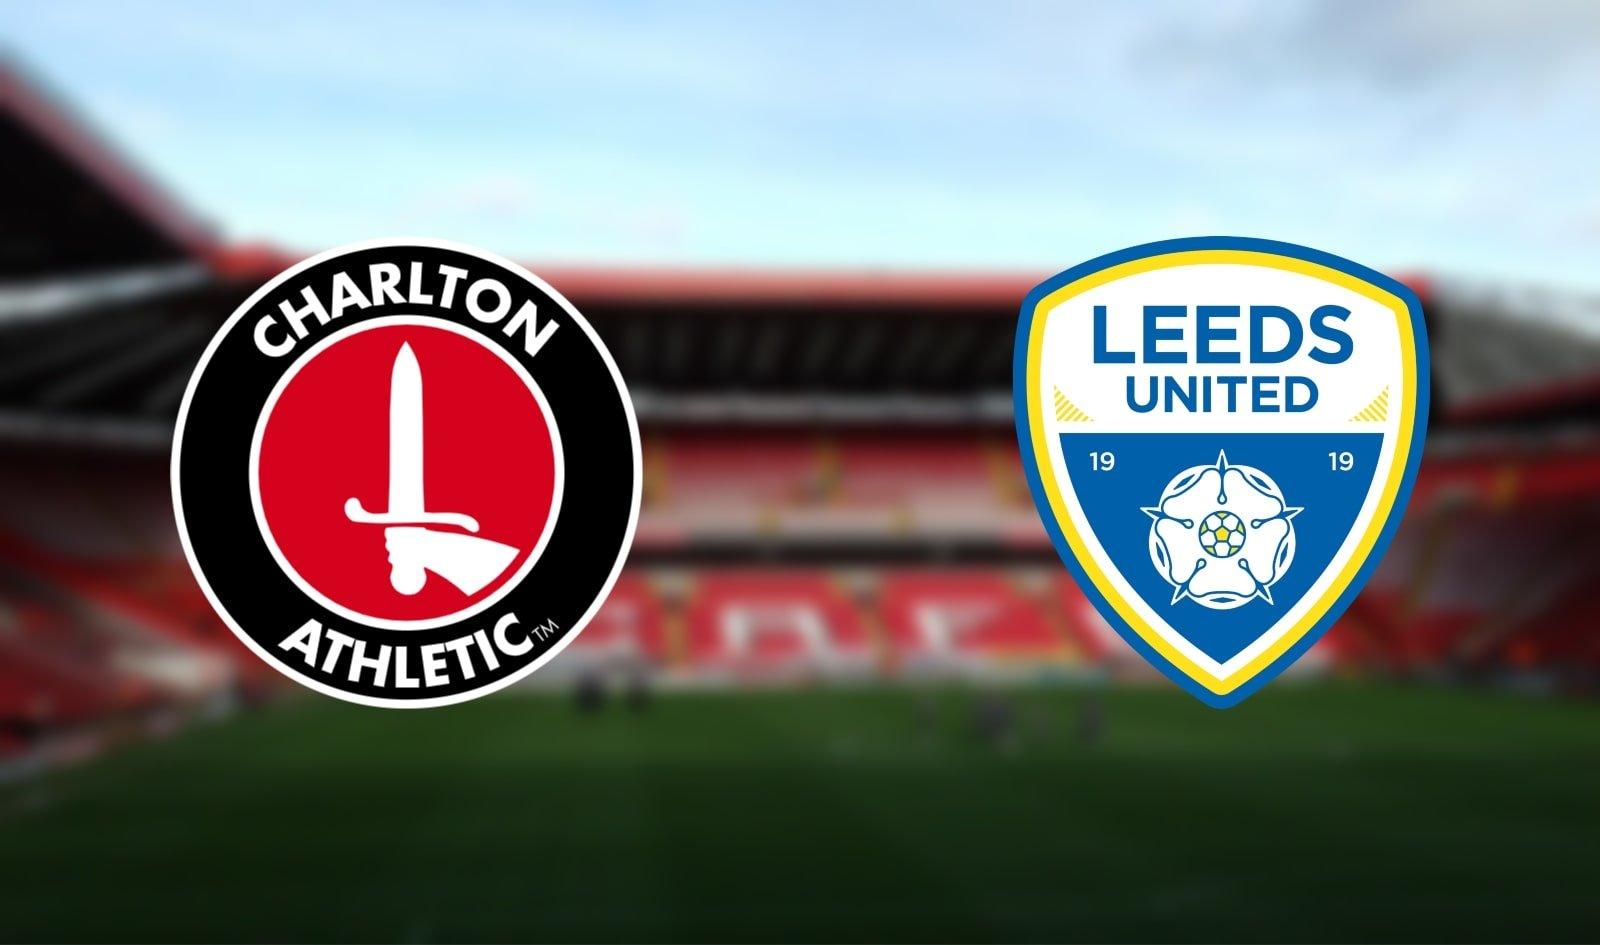 Charlton Athletic vs Leeds United Prediction: EFL Championship Match on 28.09